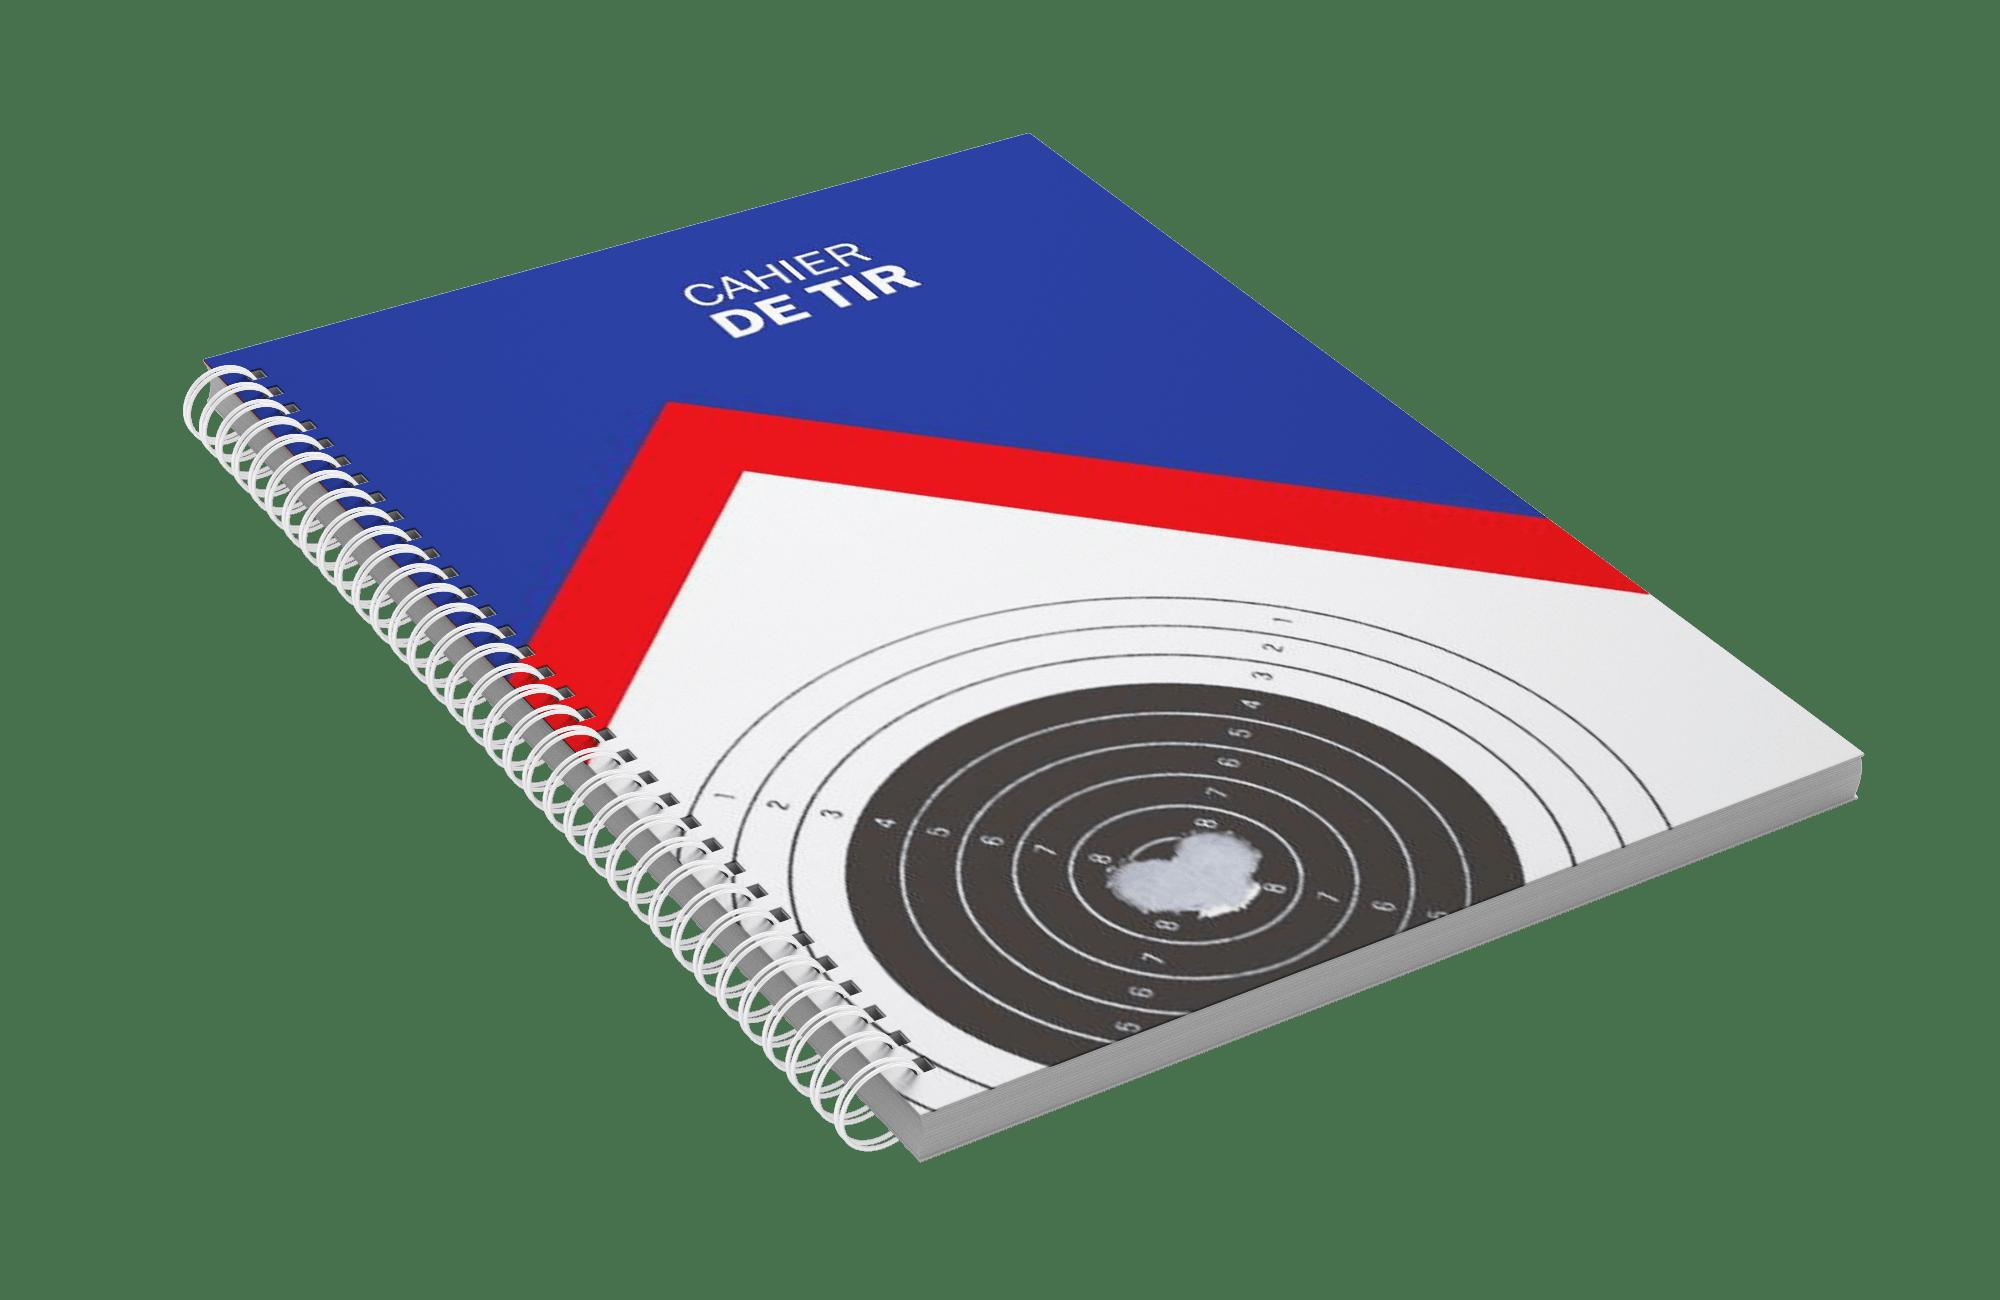 French Shooting notes shooting diary Cahier de Tir